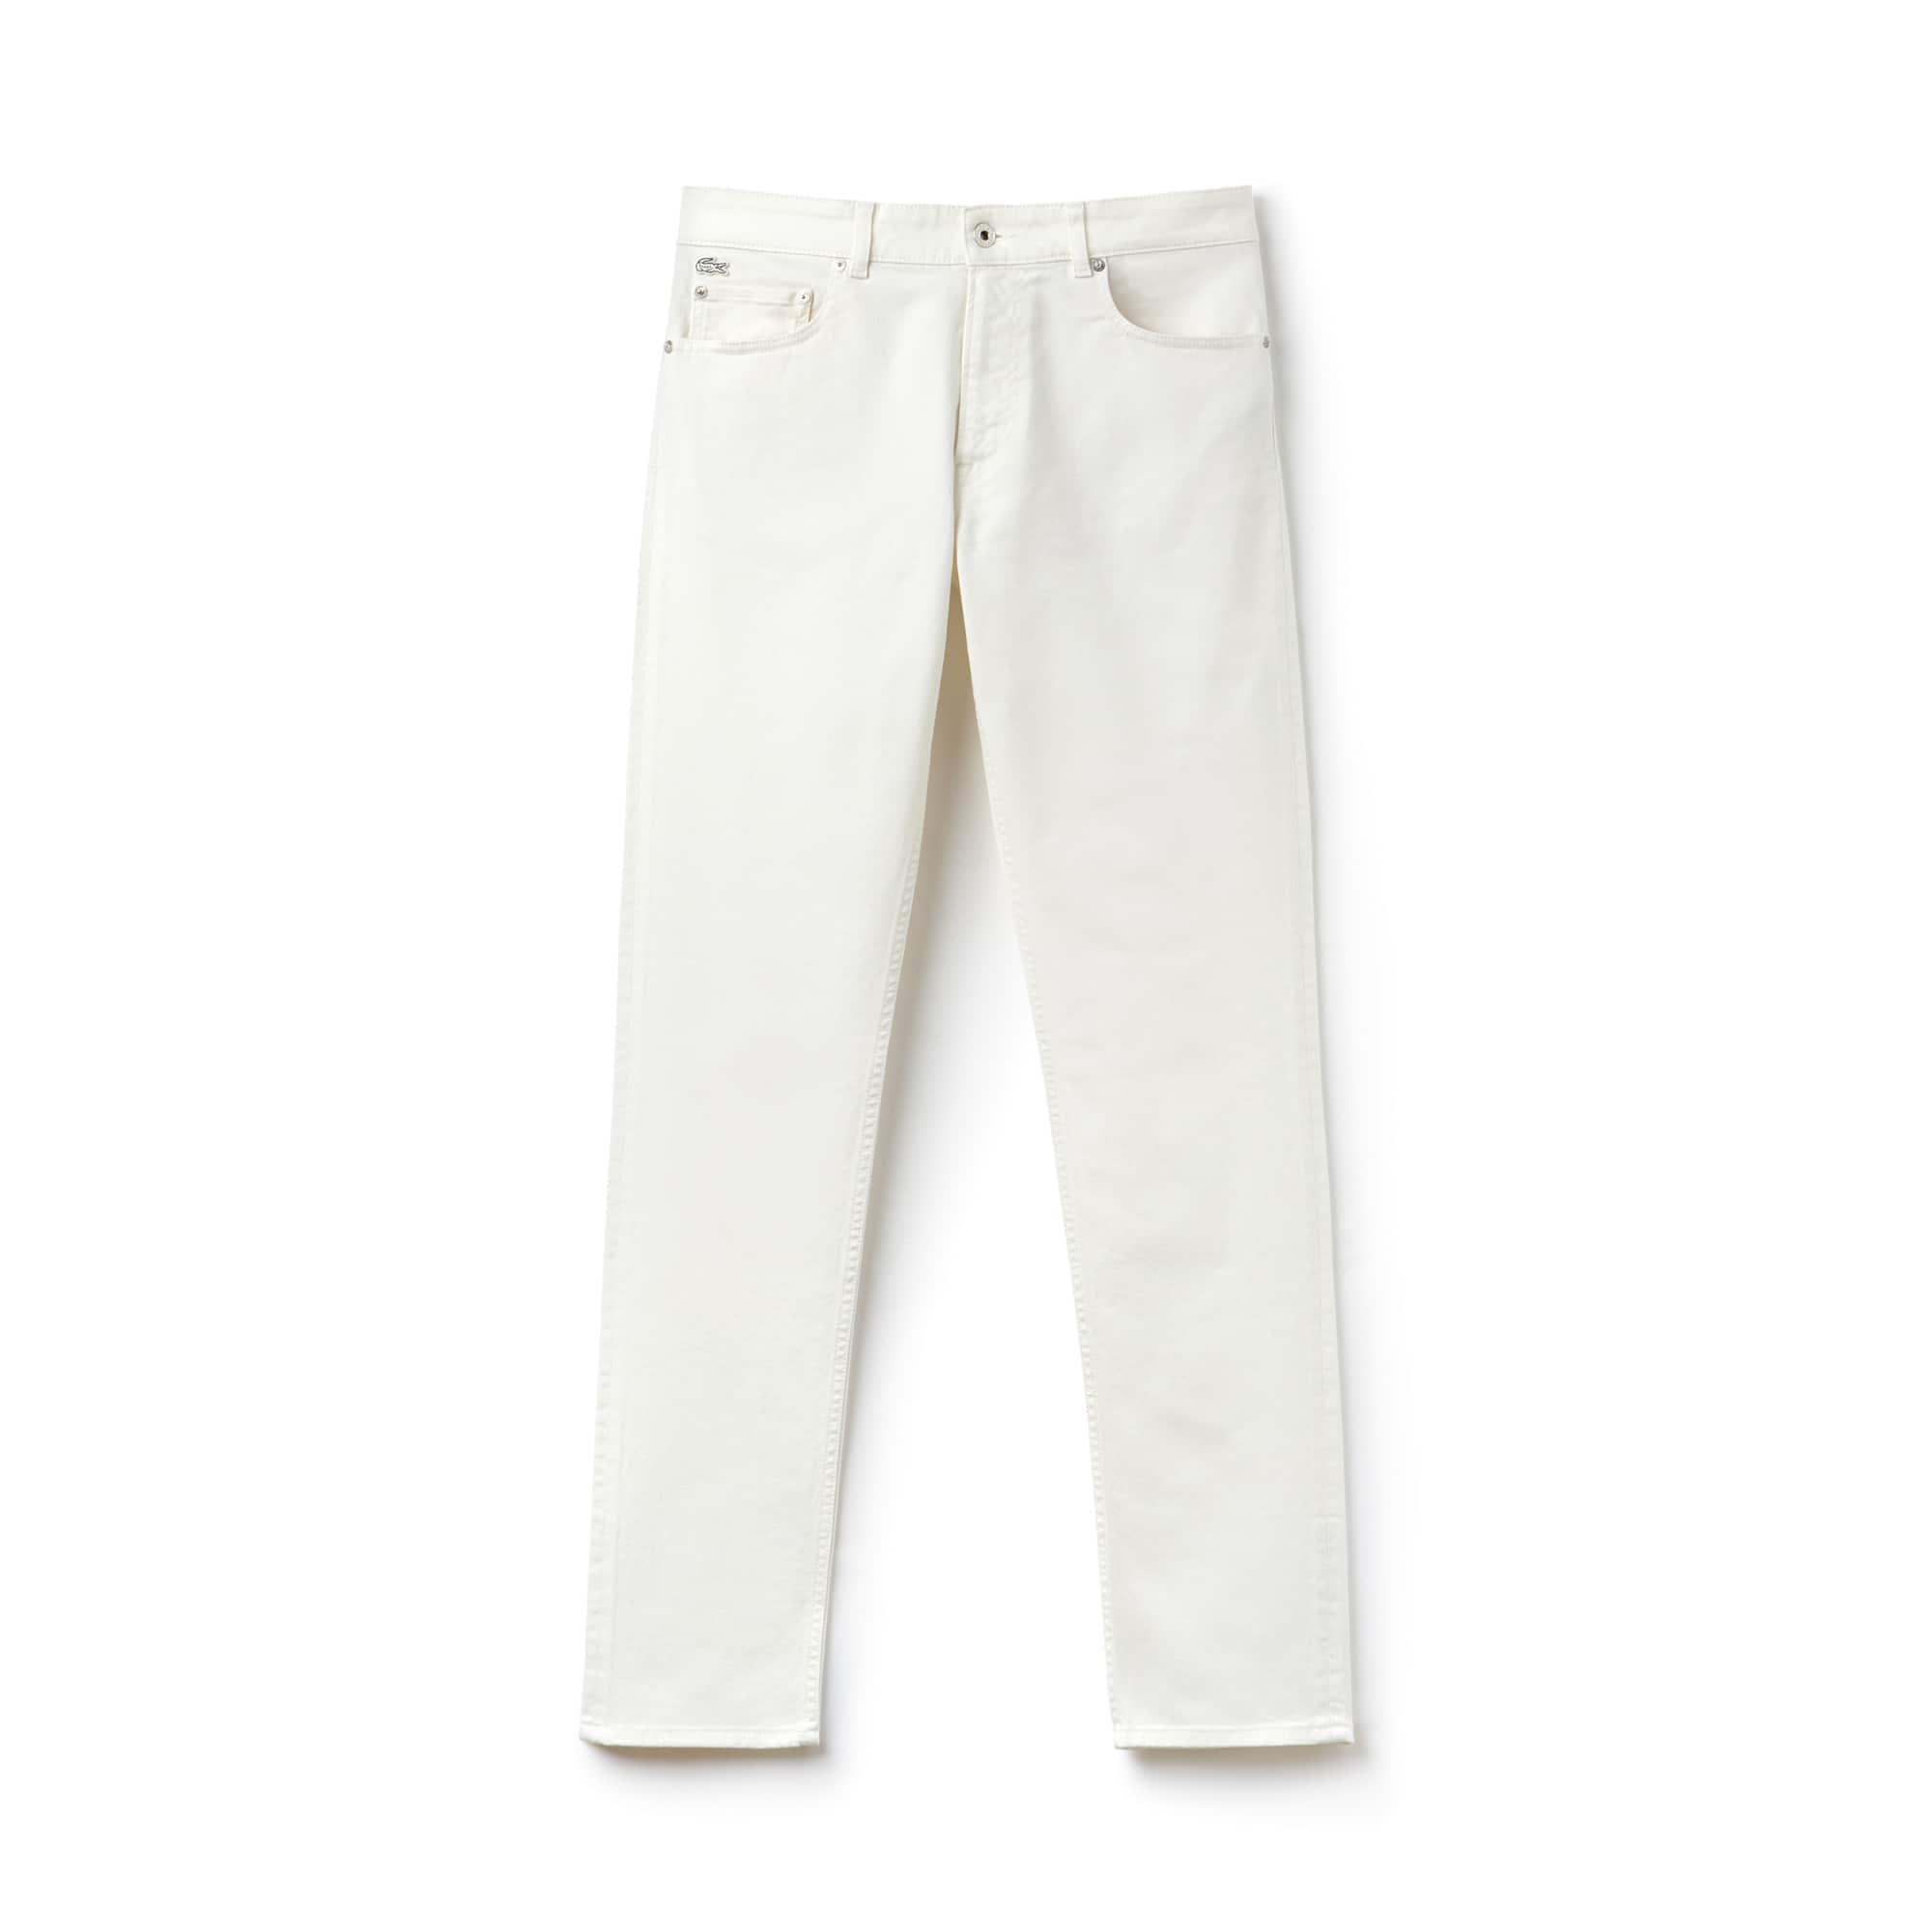 Pantalon 5 poches slim fit en twill de coton stretch uni